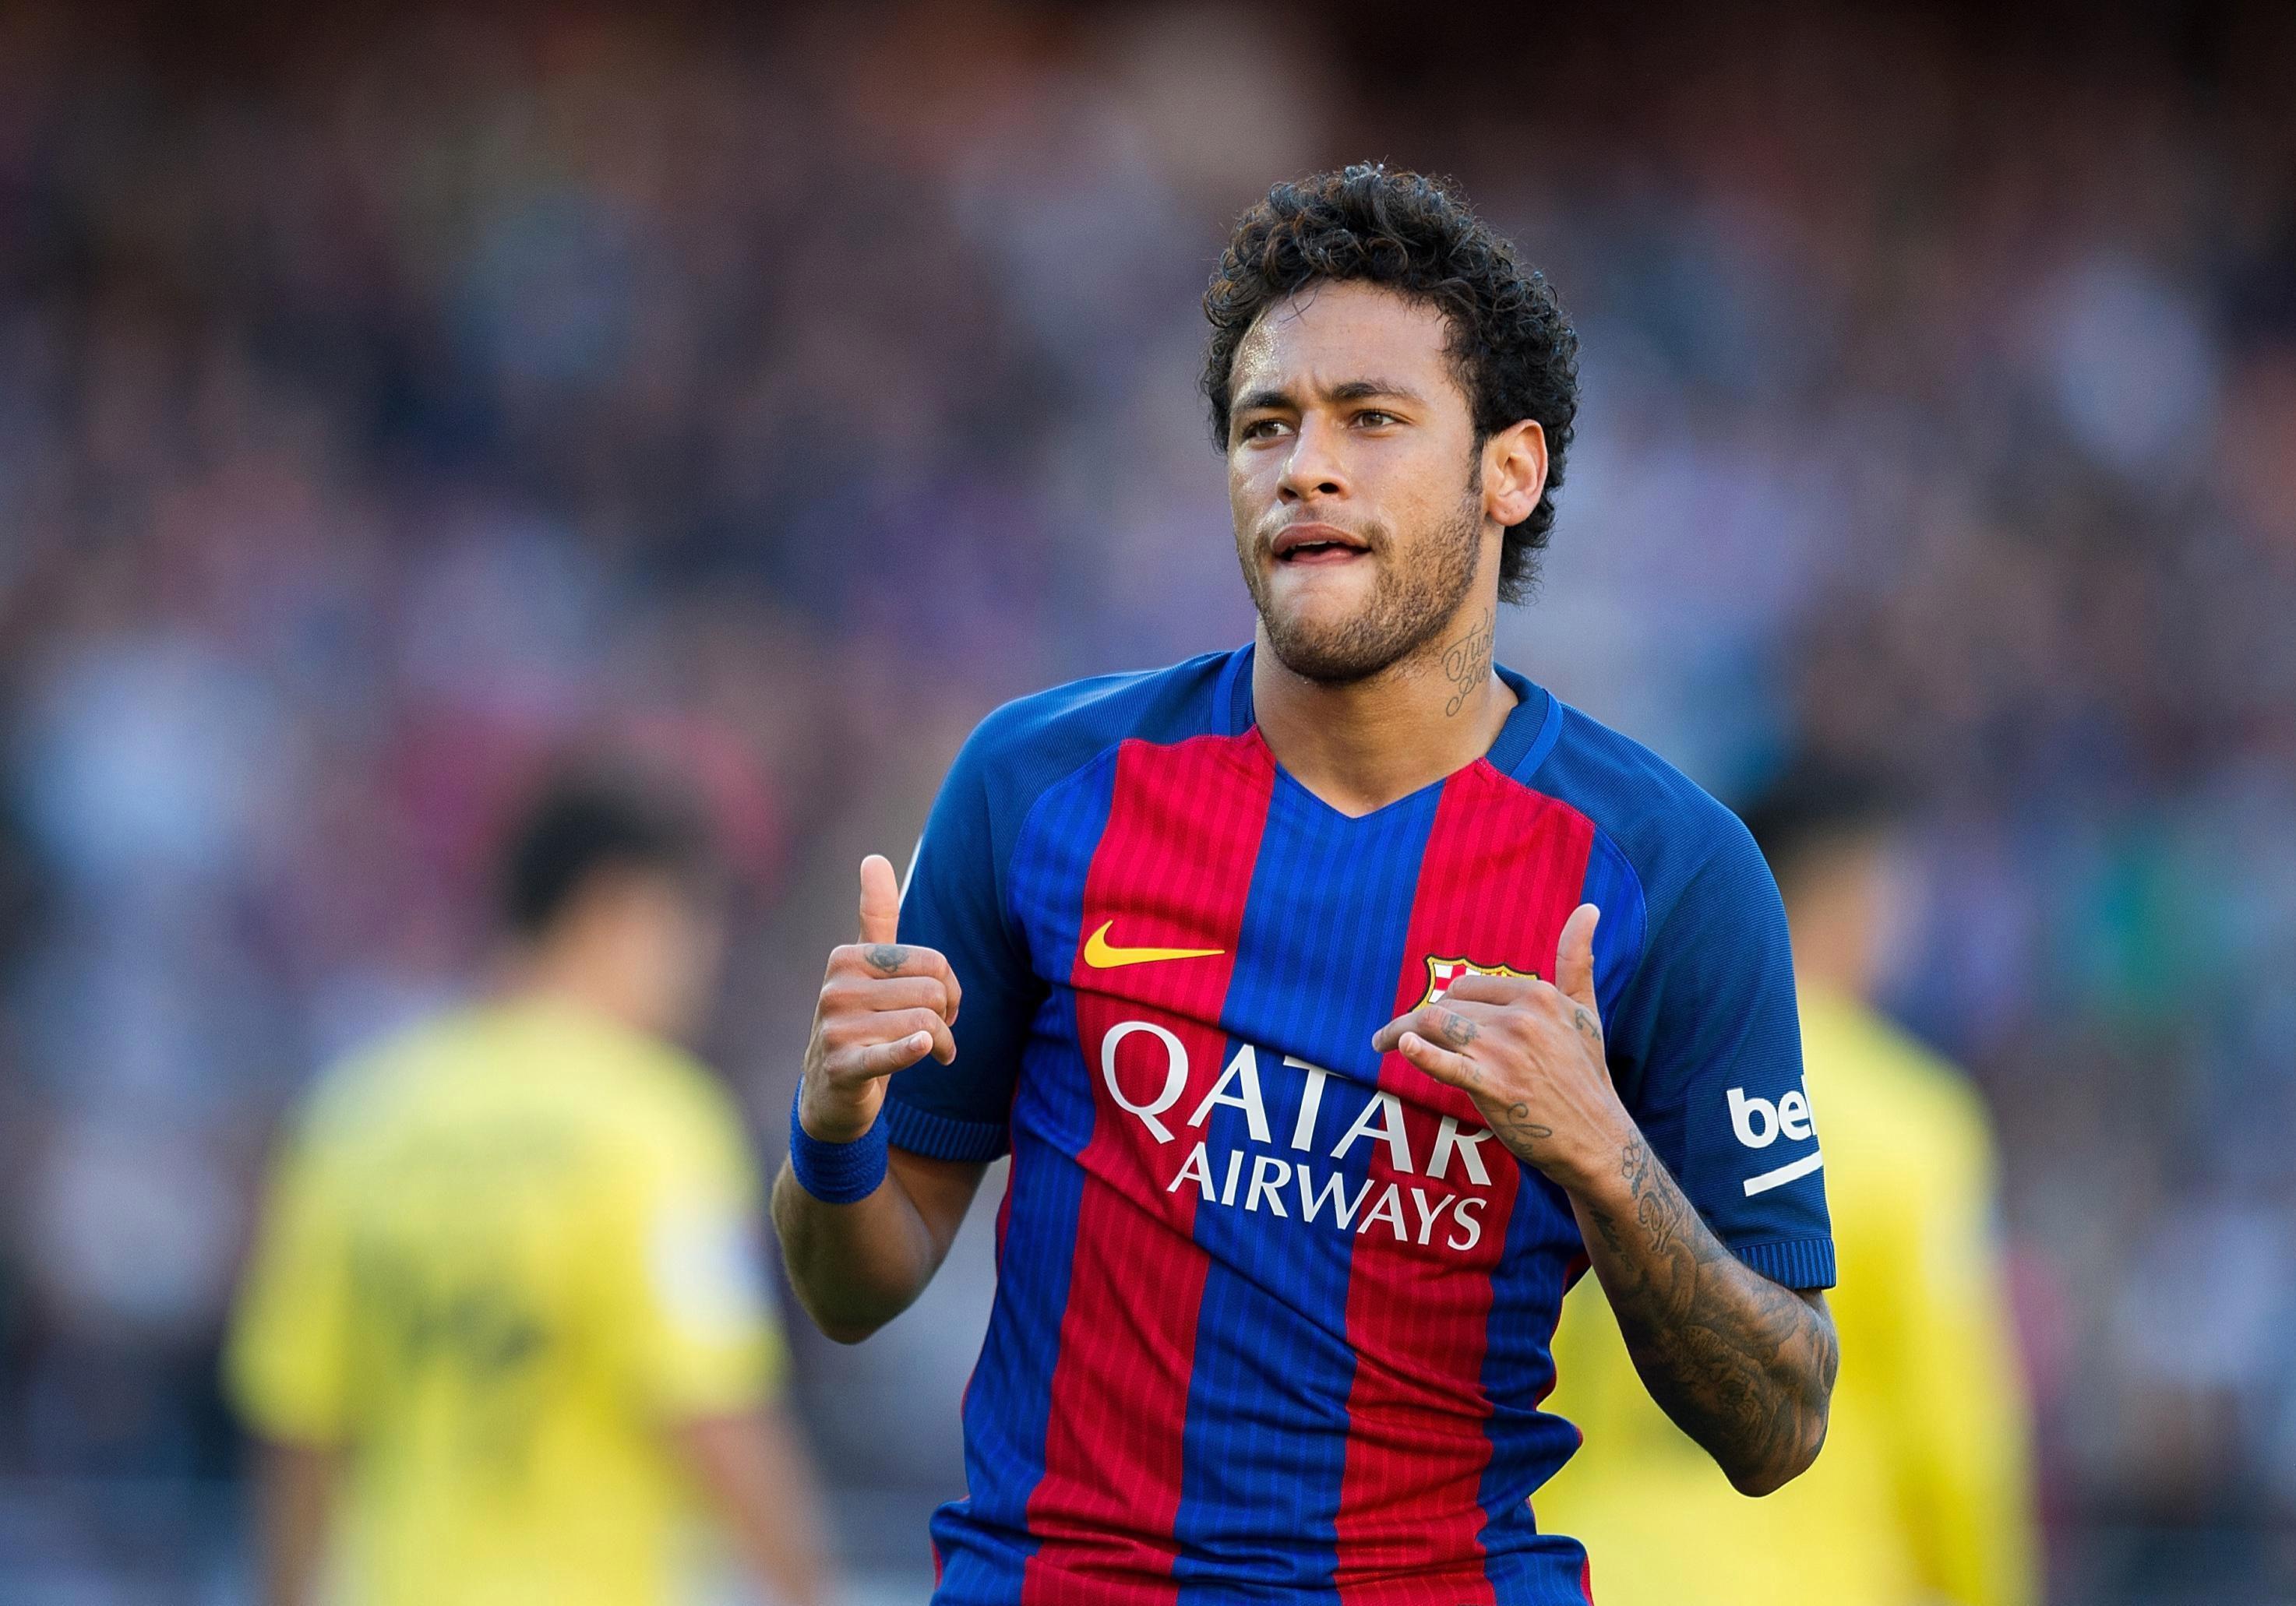 Neymar was used as bait by Barcelona